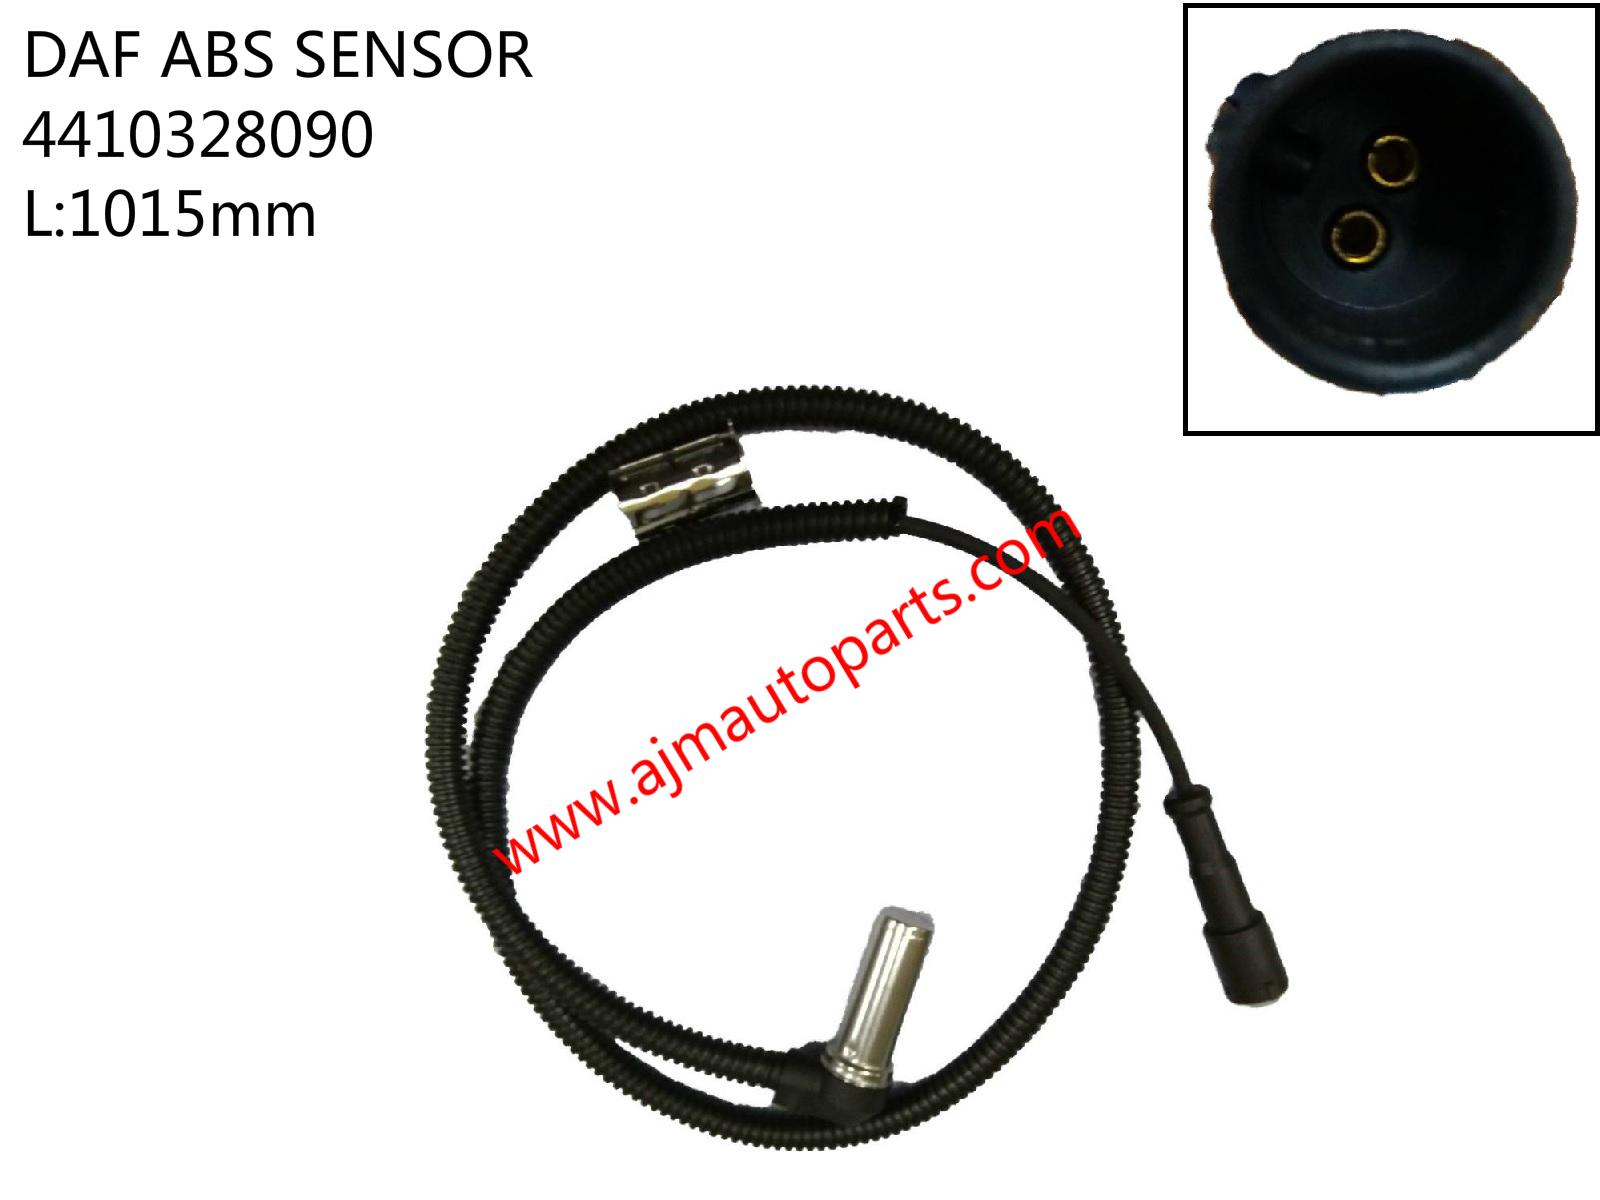 DAF ABS SENSOR-4410328090